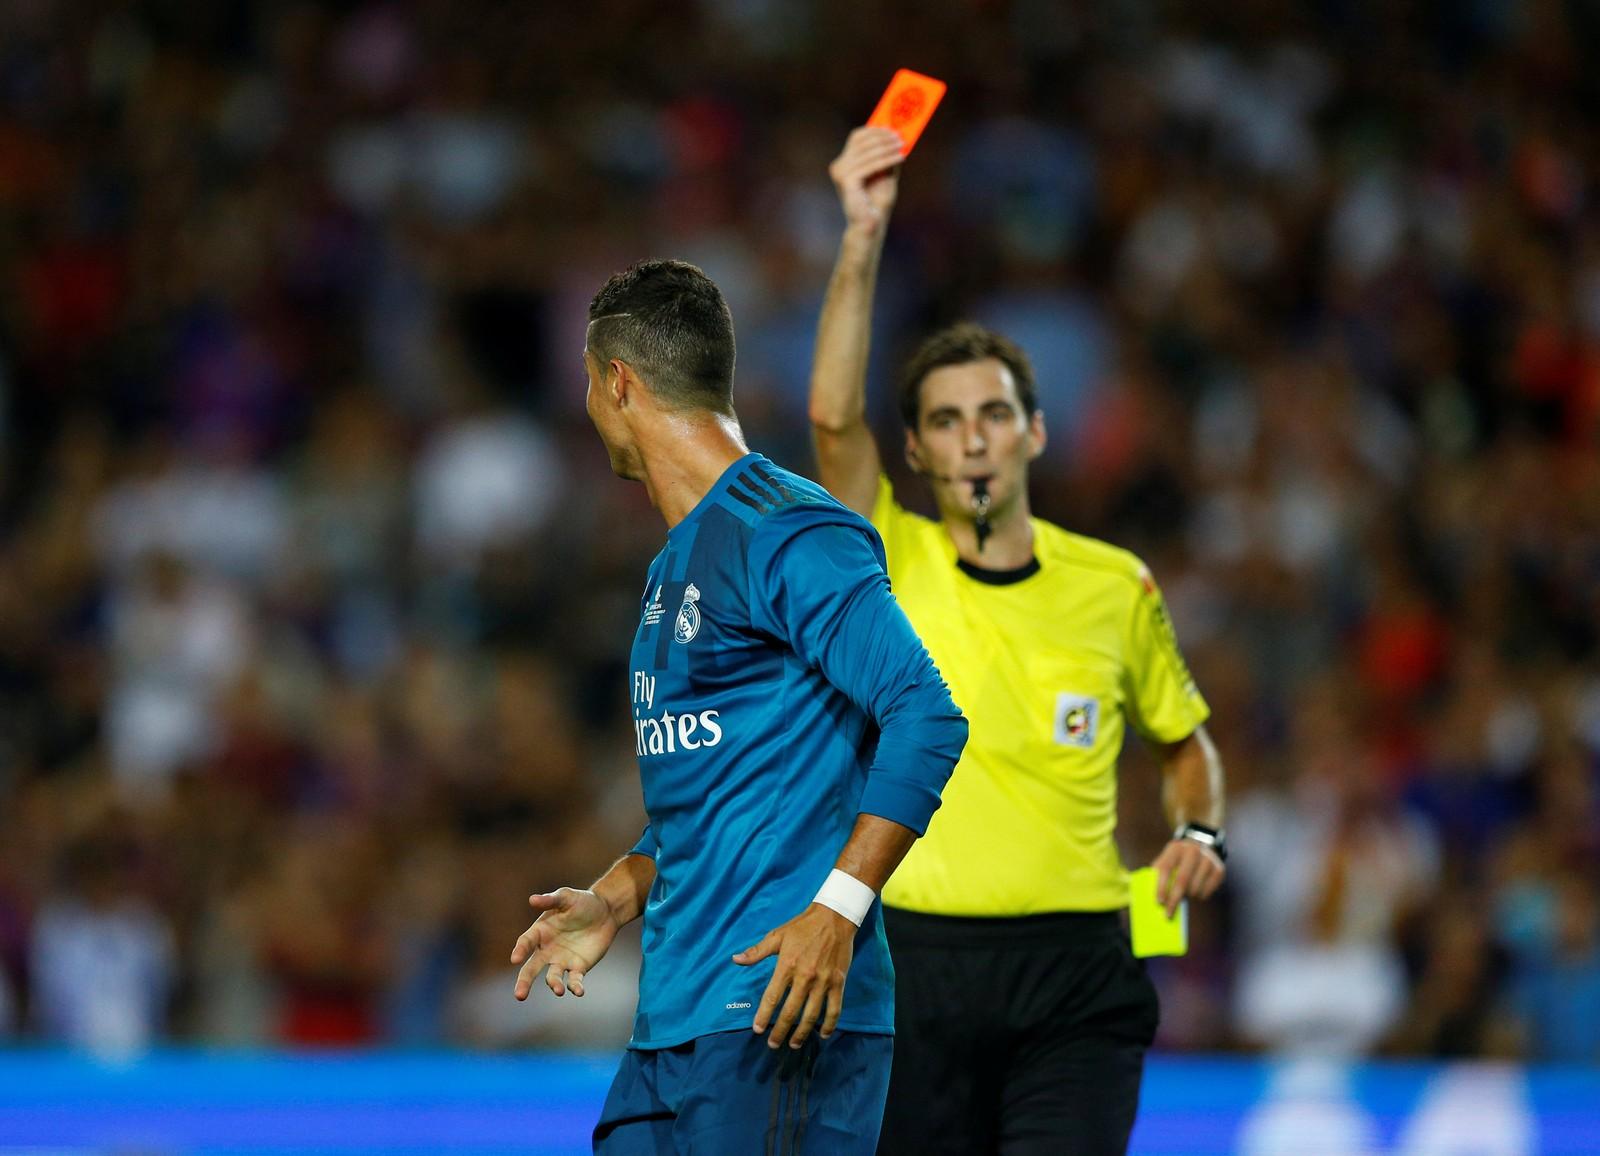 Cristiano Ronaldo reçoit un carton rouge au clásico